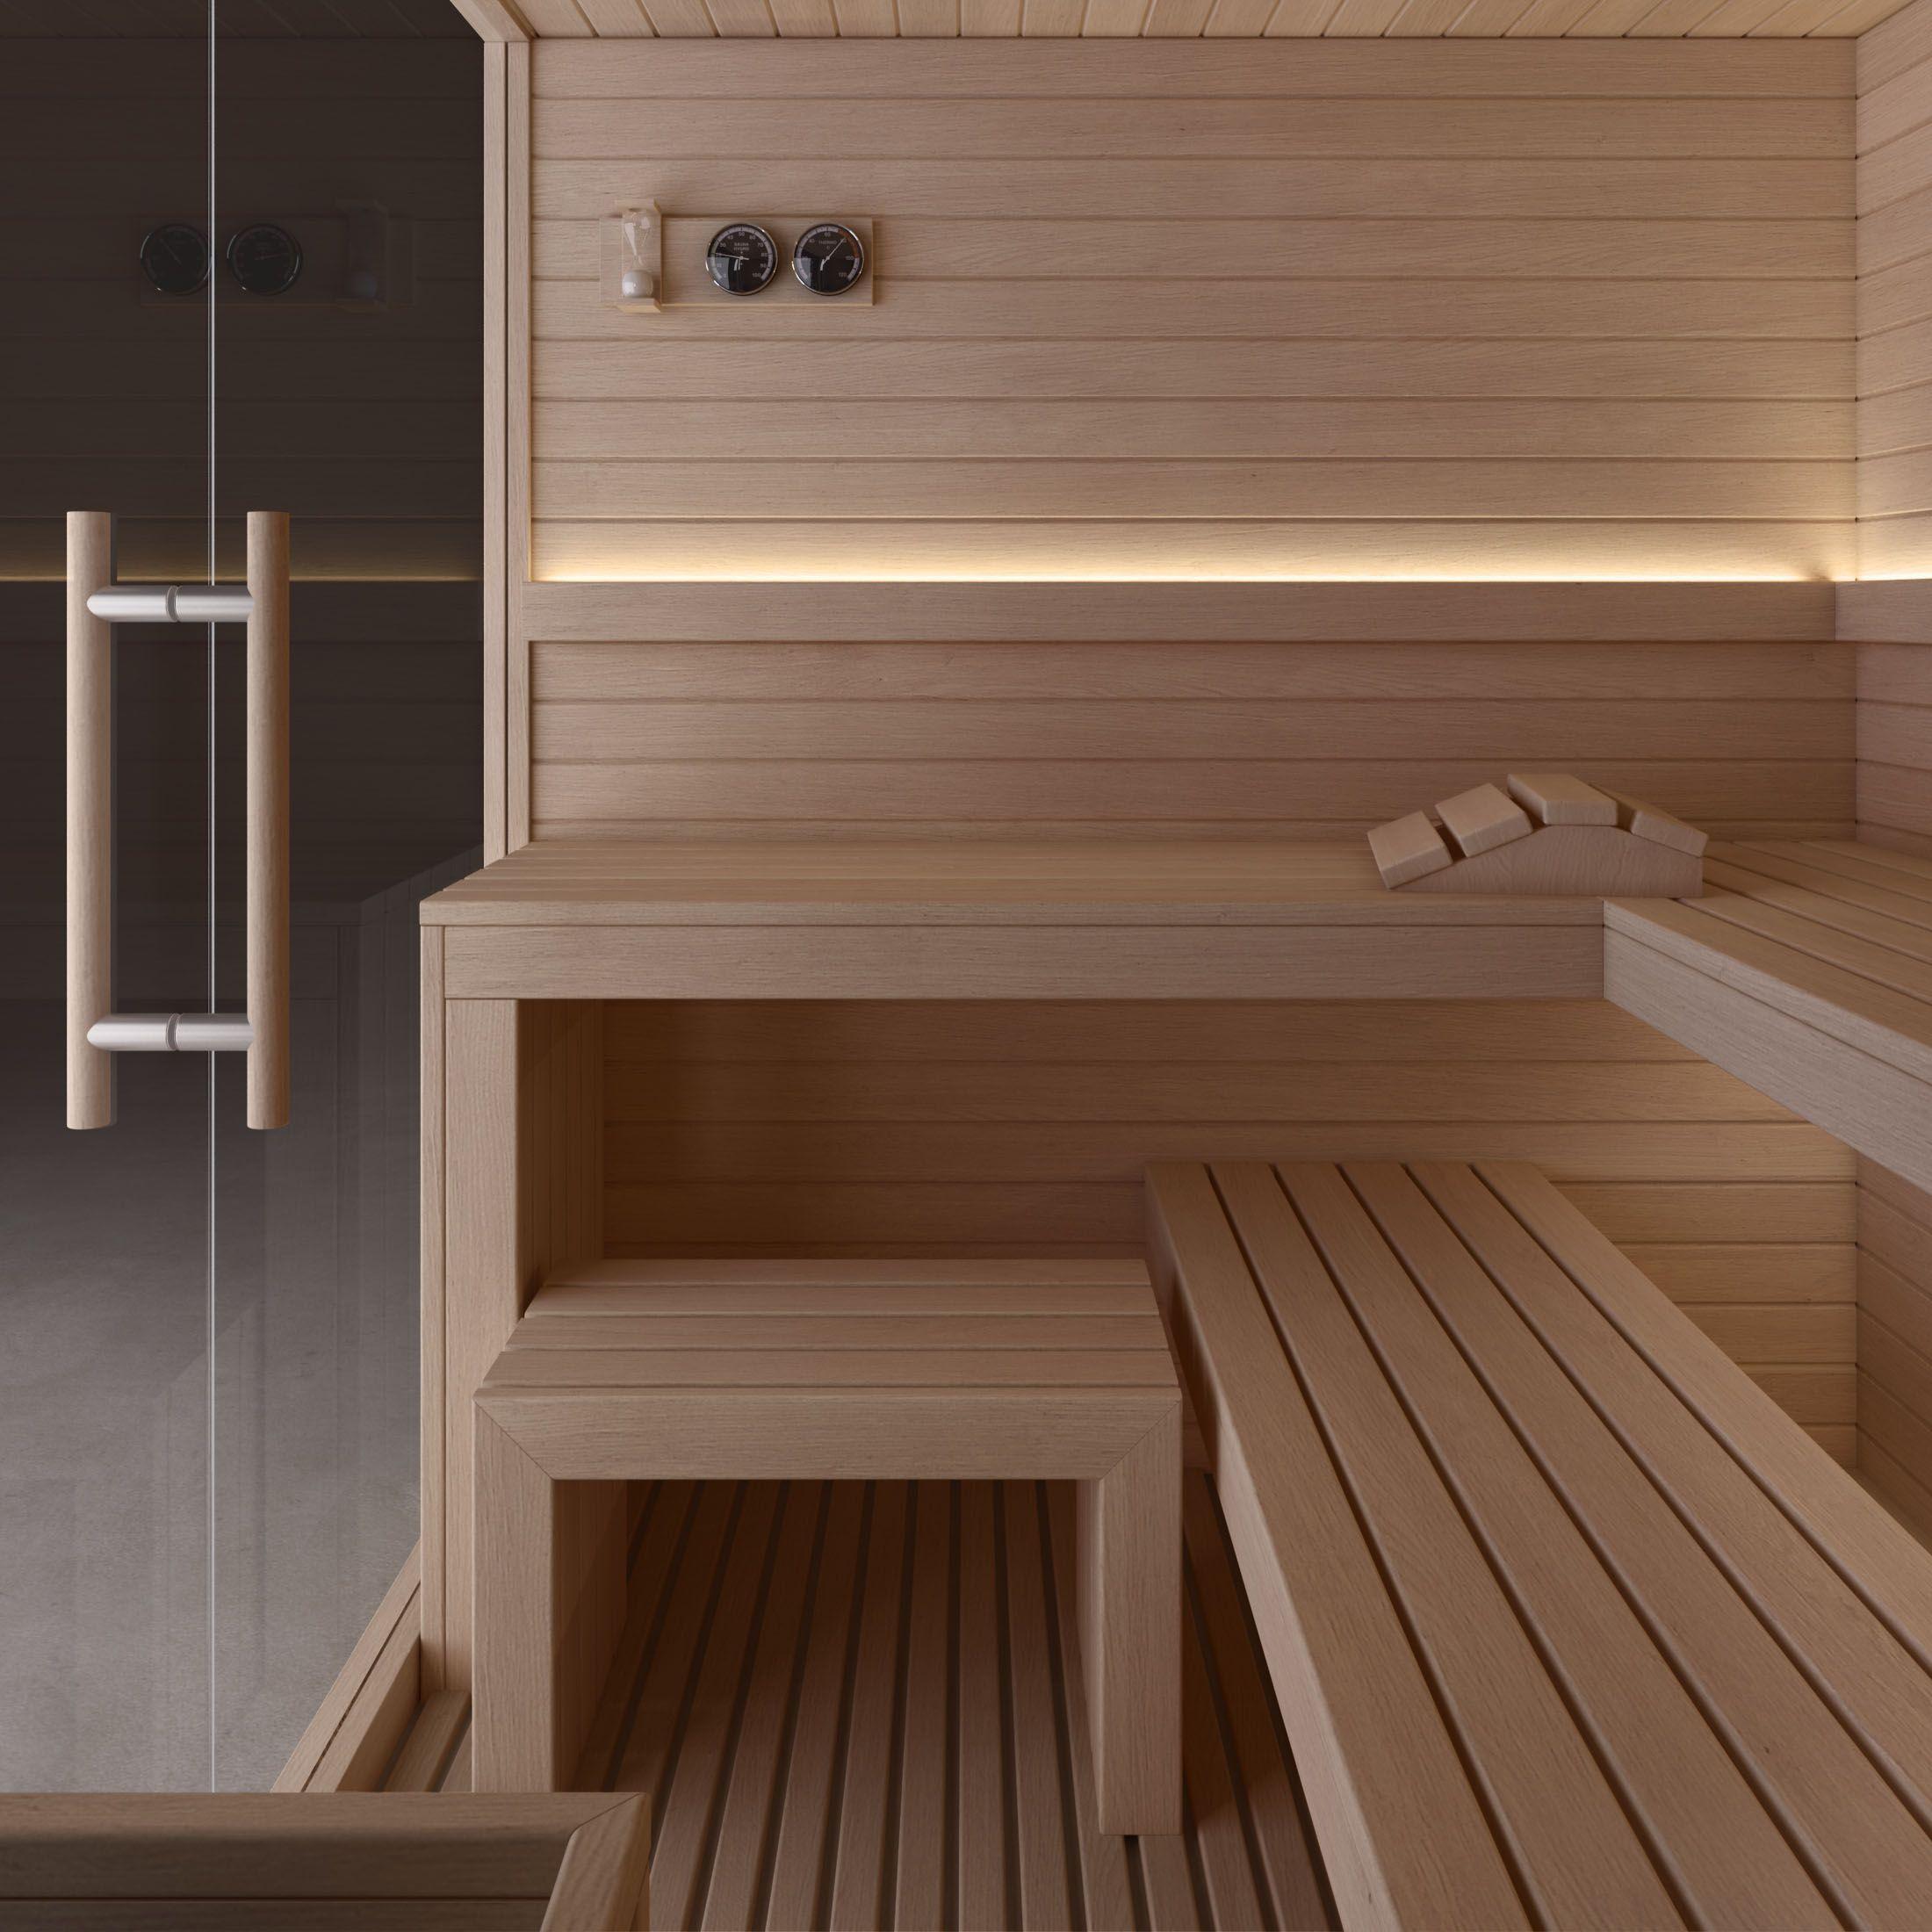 les 25 meilleures id es de la cat gorie sauna hammam sur pinterest spa hammam hammam et spa sauna. Black Bedroom Furniture Sets. Home Design Ideas